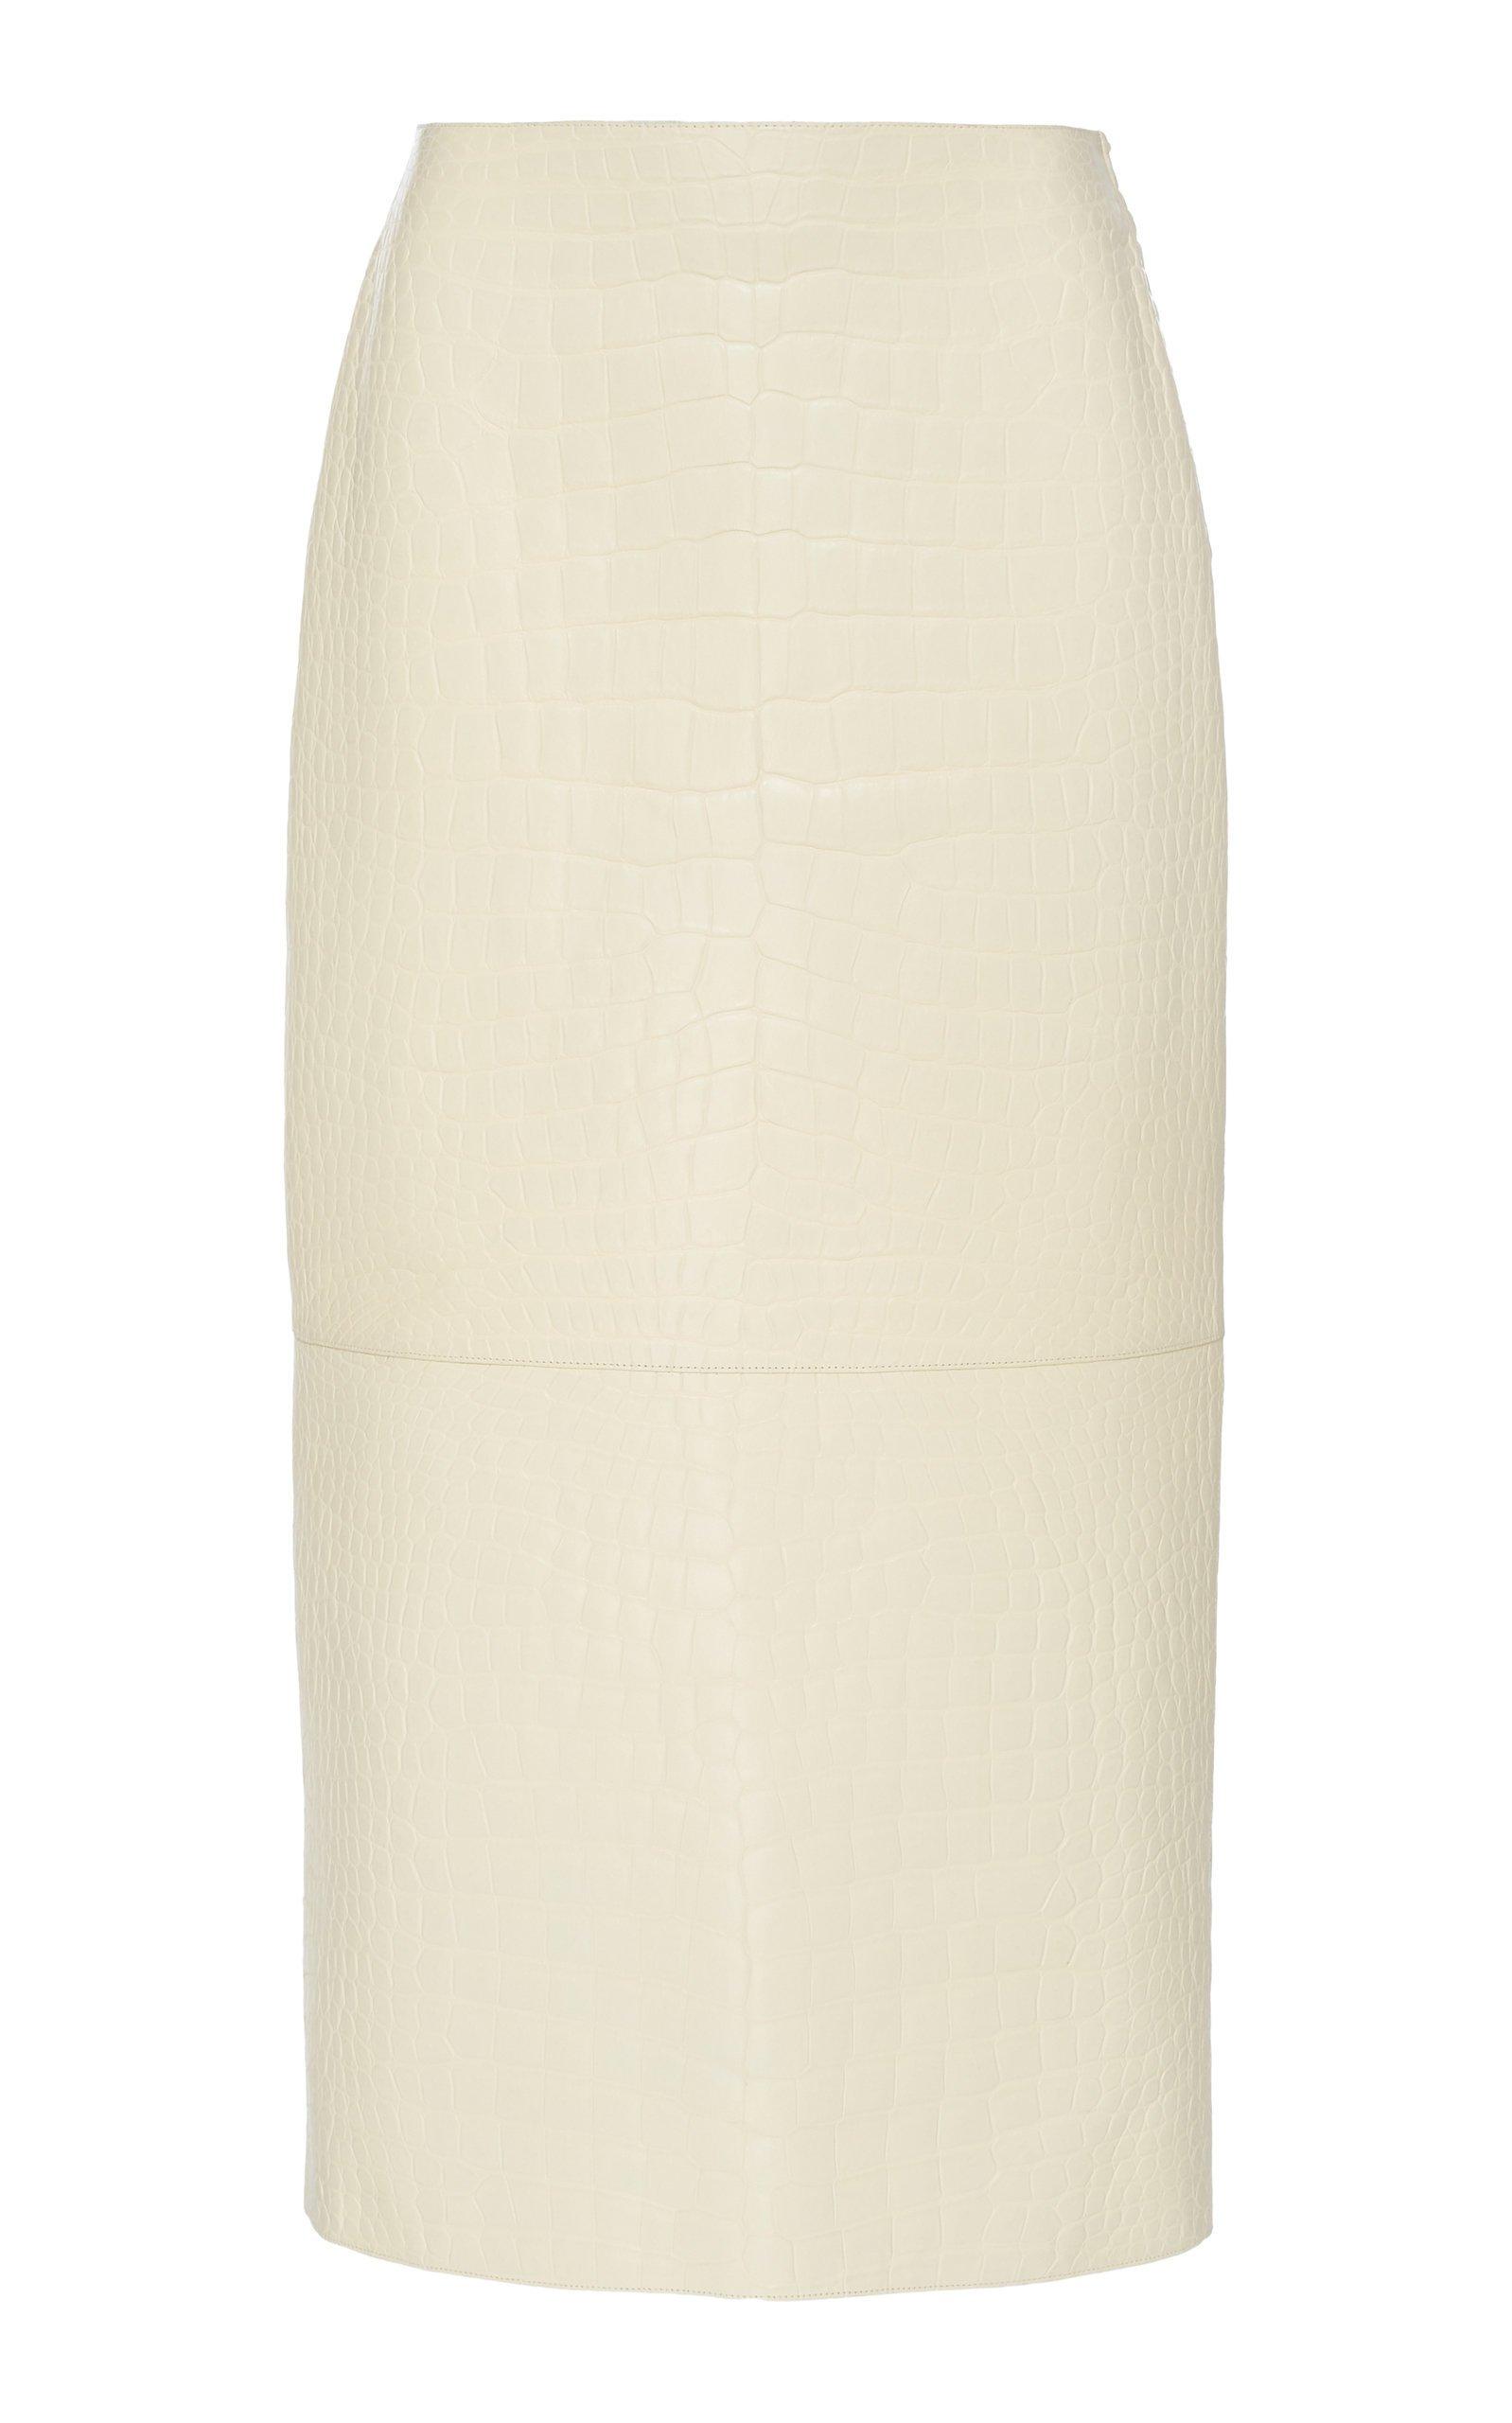 The Row Jenna Crocodile Midi Skirt Size: 2